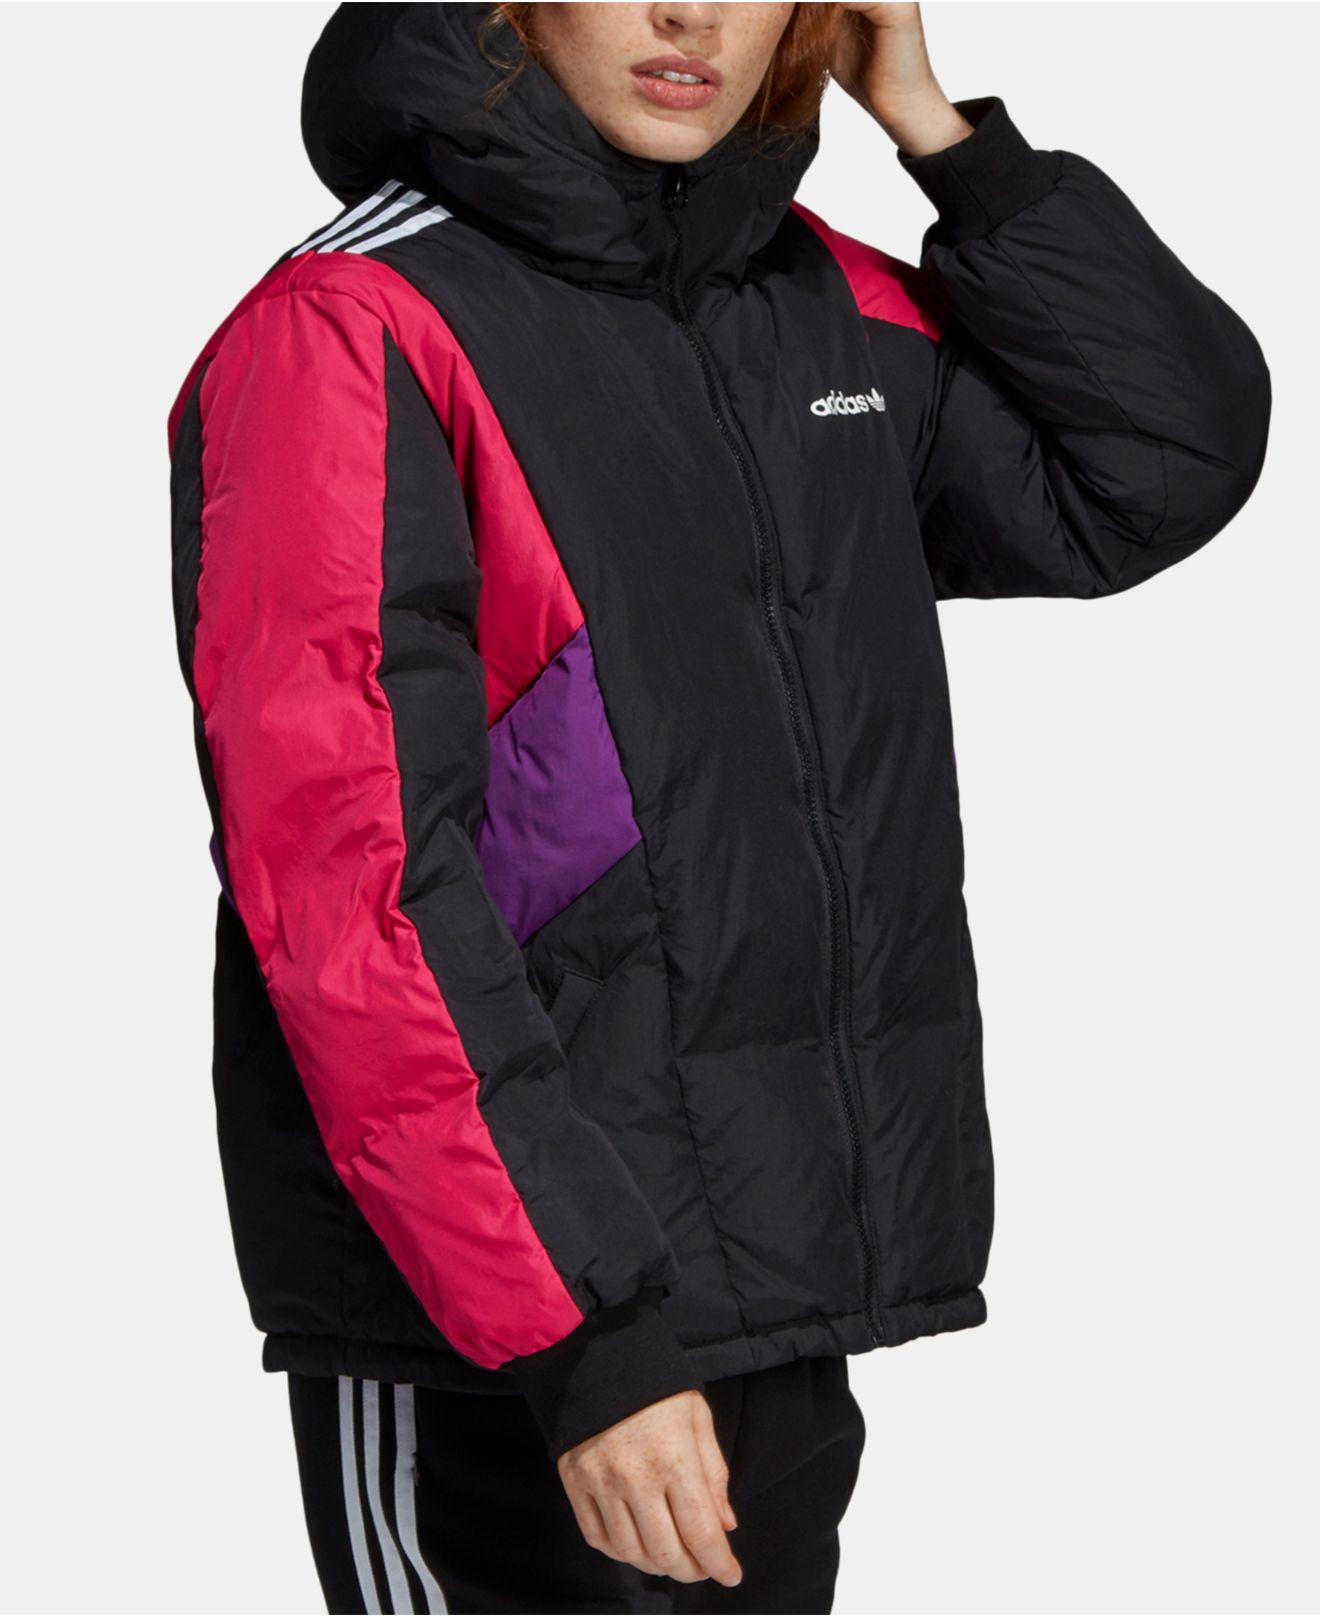 159b91f457b7 adidas Originals 90s Colorblocked Hooded Down Jacket in Black - Lyst